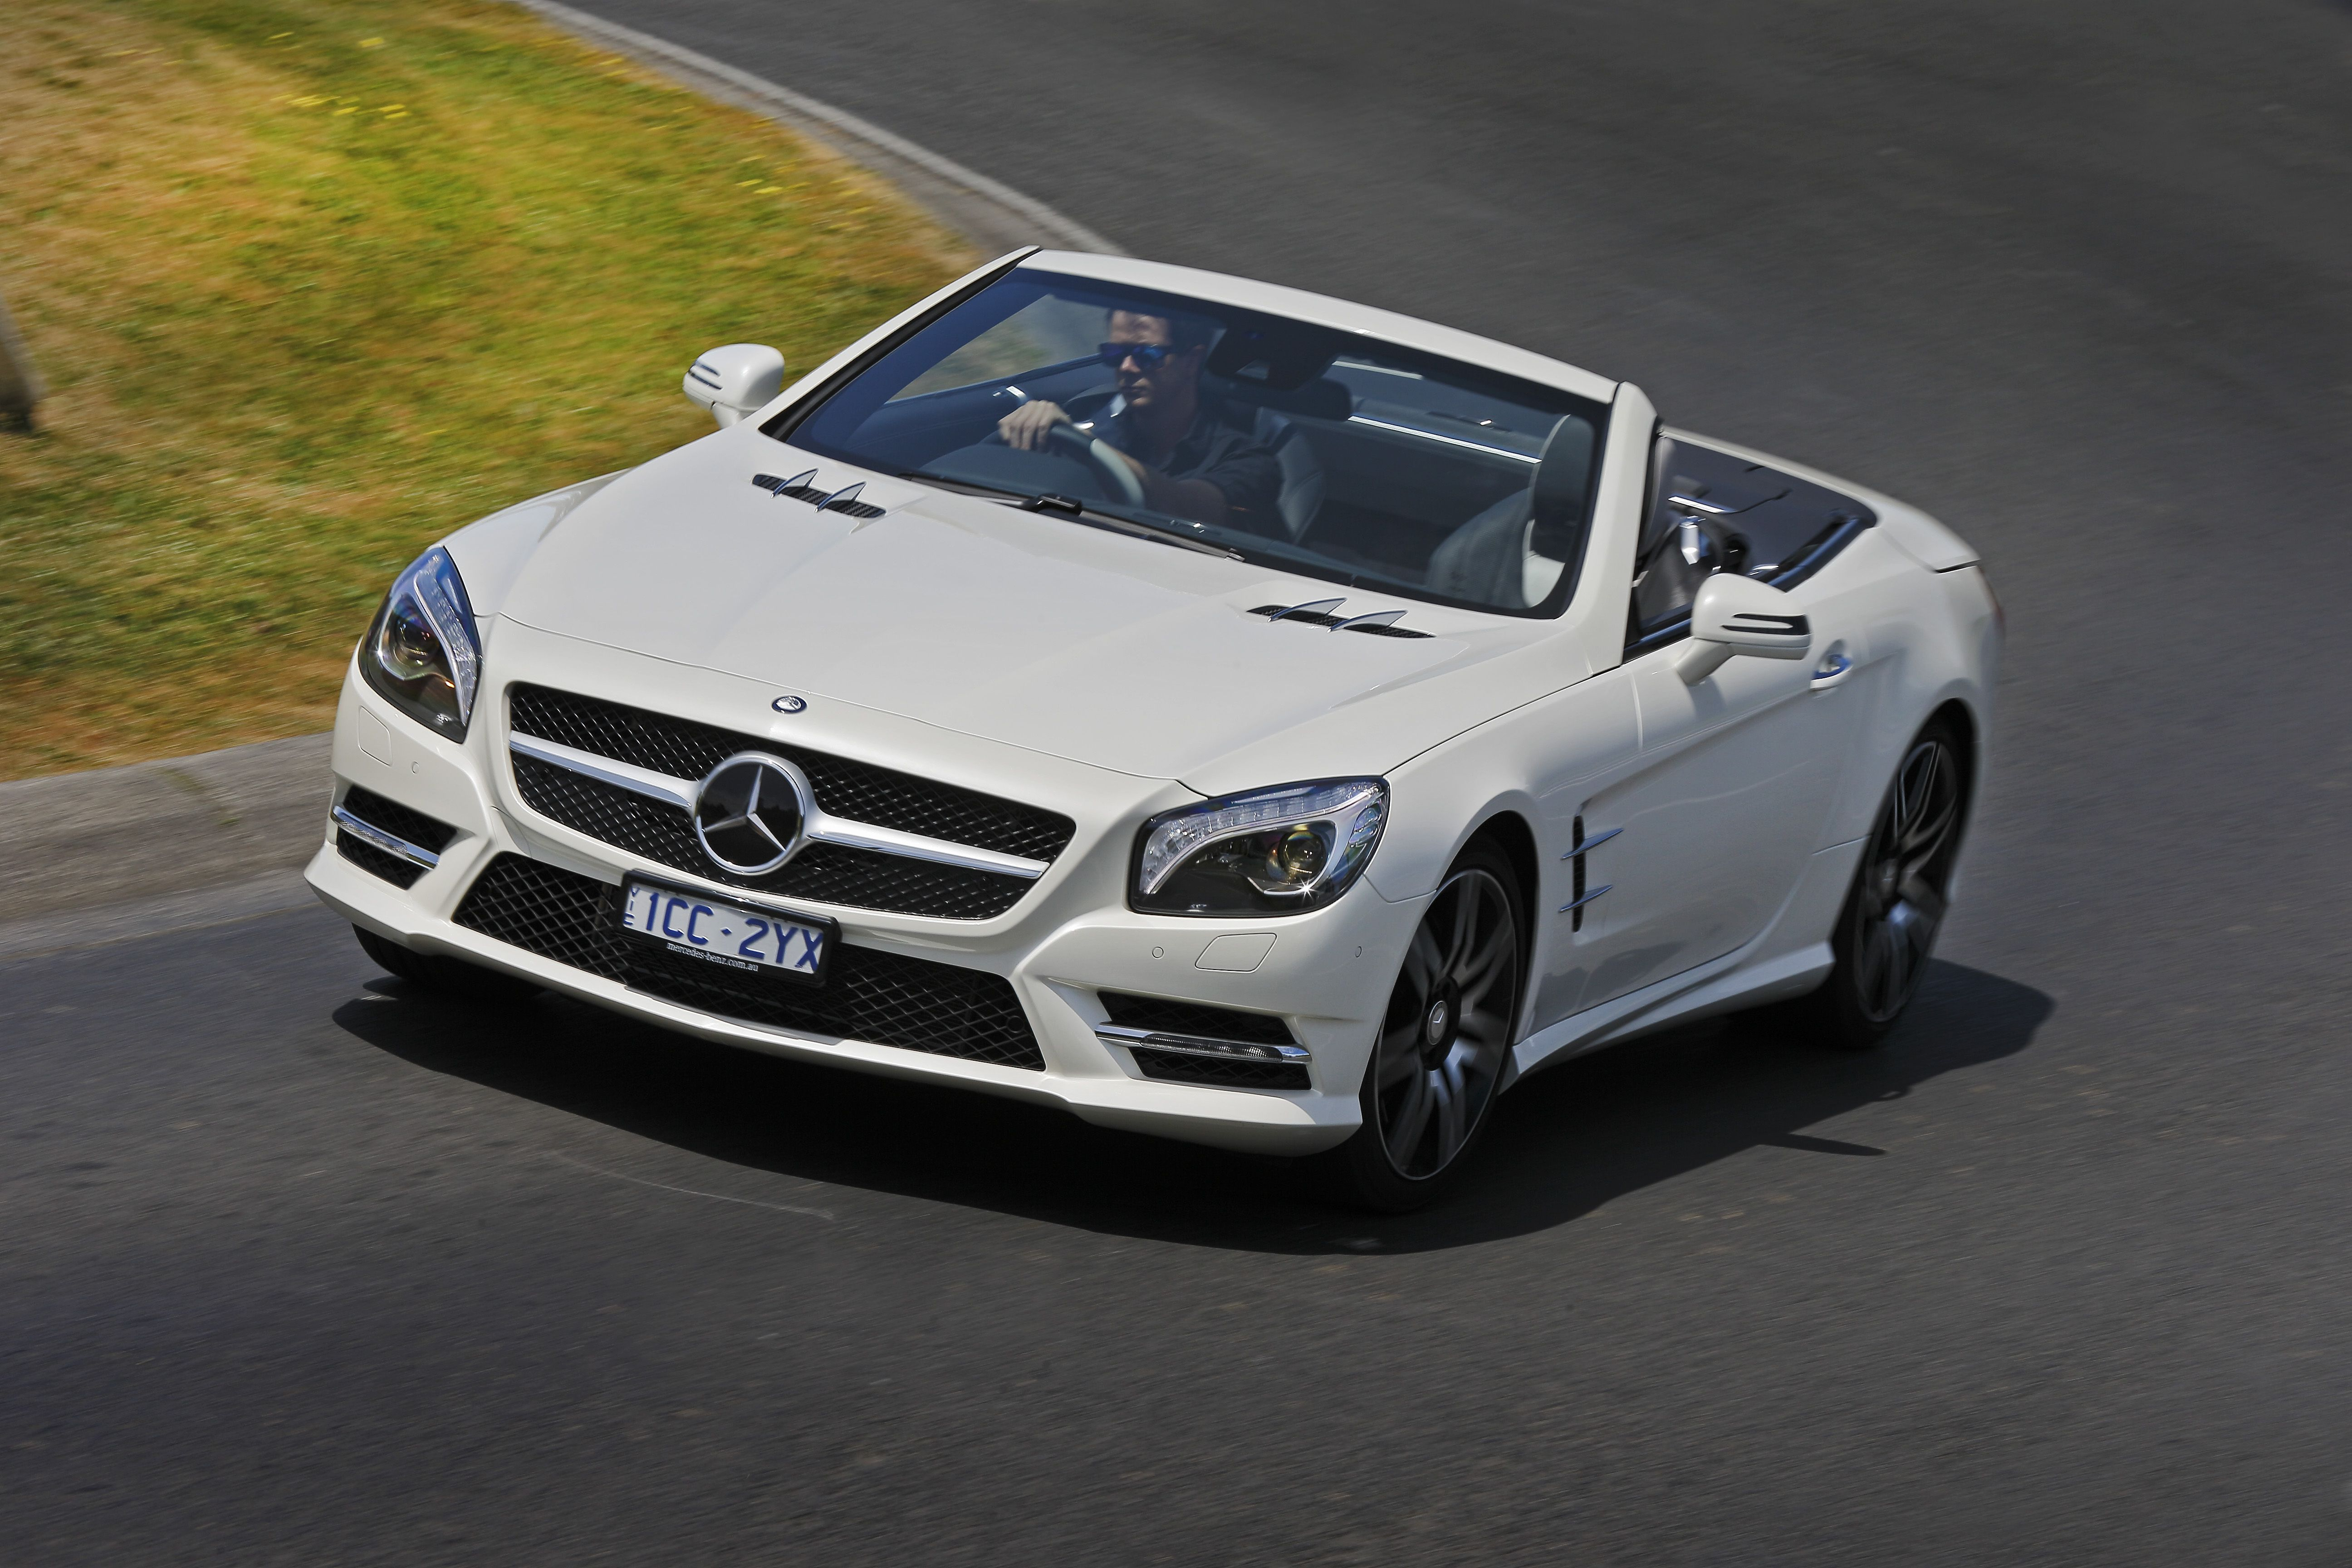 2015 Mercedes Benz SL 400 Review - http://www.caradvice.com.au/323444/2015-mercedes-benz-sl-400-review/ http://linkat.info/